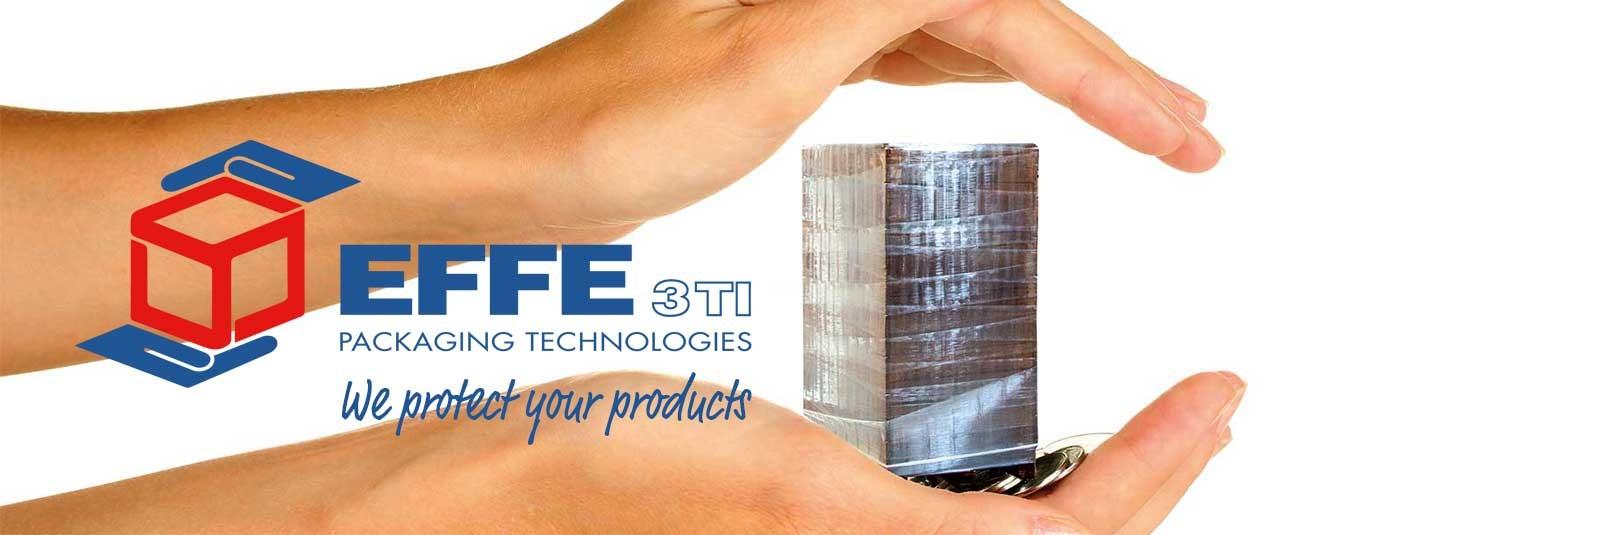 Packaging Technologies